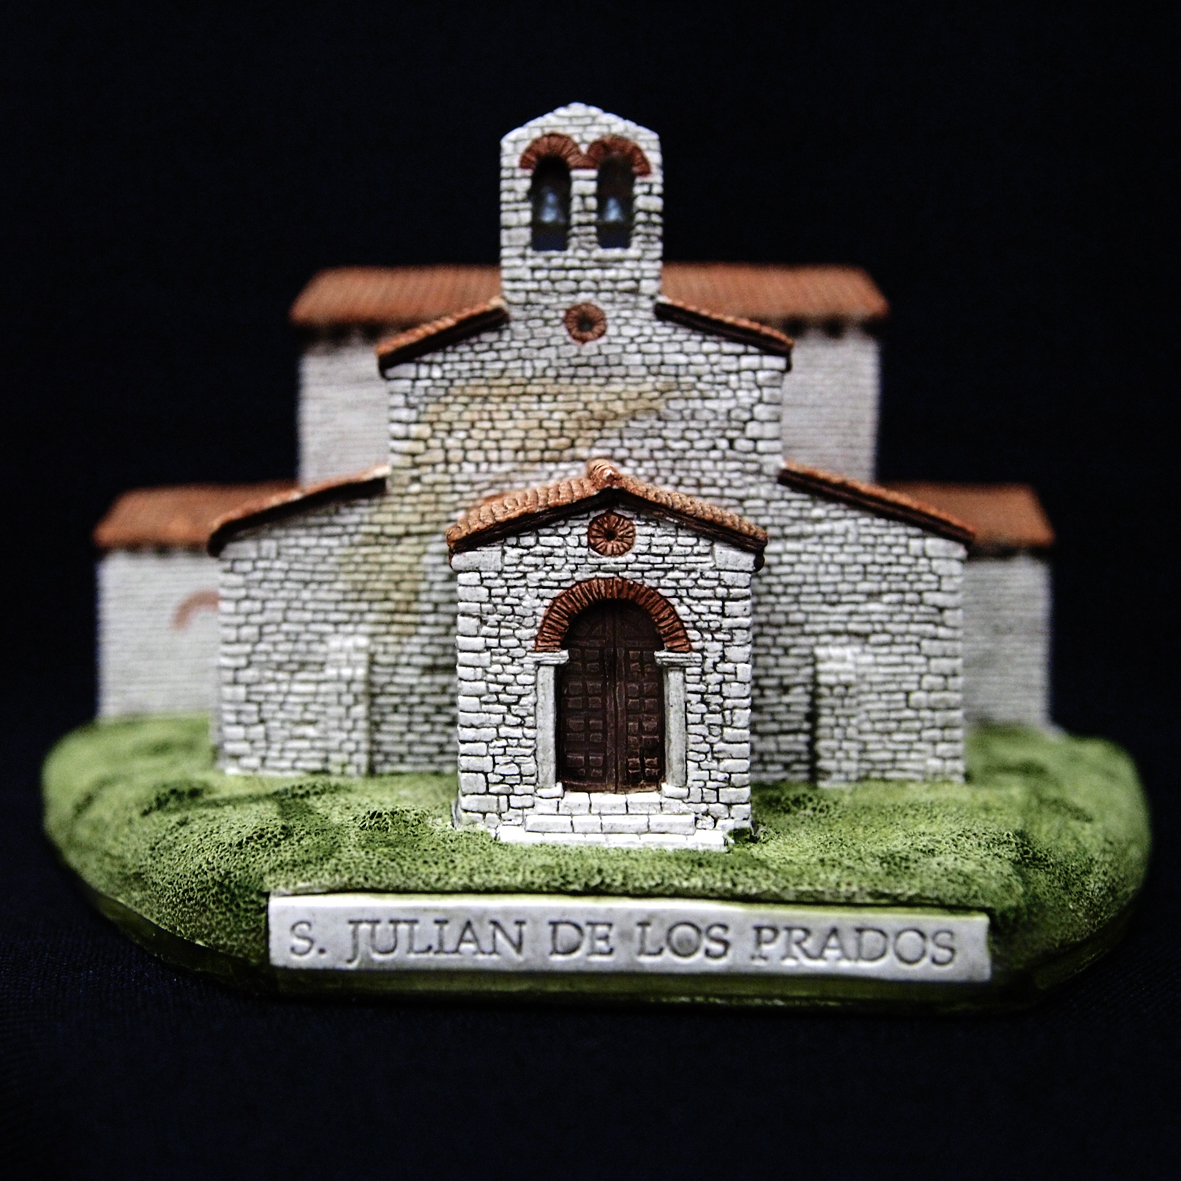 Iglesia de San Julián de los Prados (Oviedo) (Asturias)